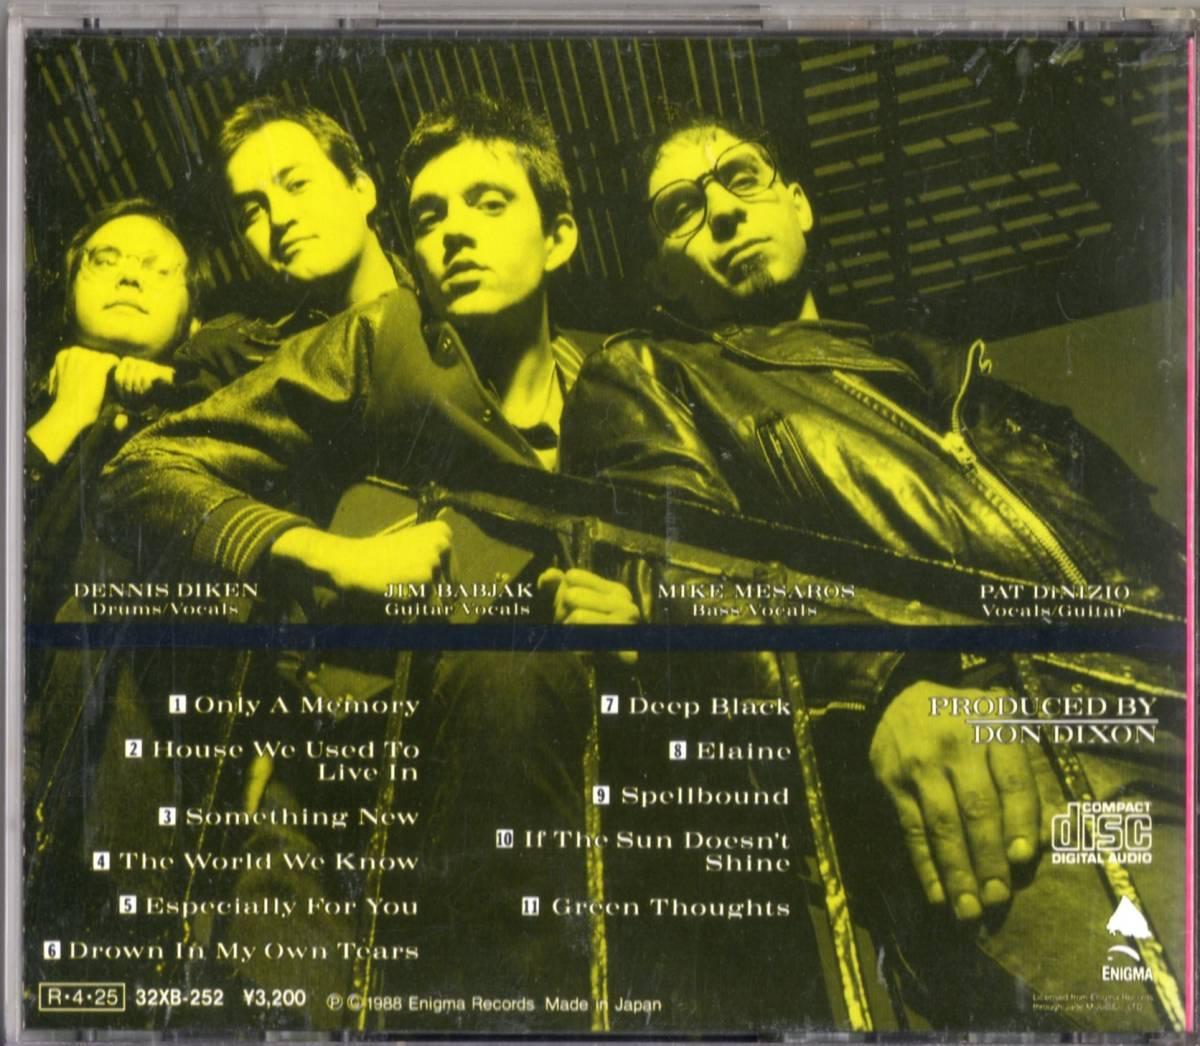 The Smithereens /Green Thoughts【Del Shannon参加・Don Dixonプロデュース日本盤CD】1988年*ザ・スミザリーンズ_画像2